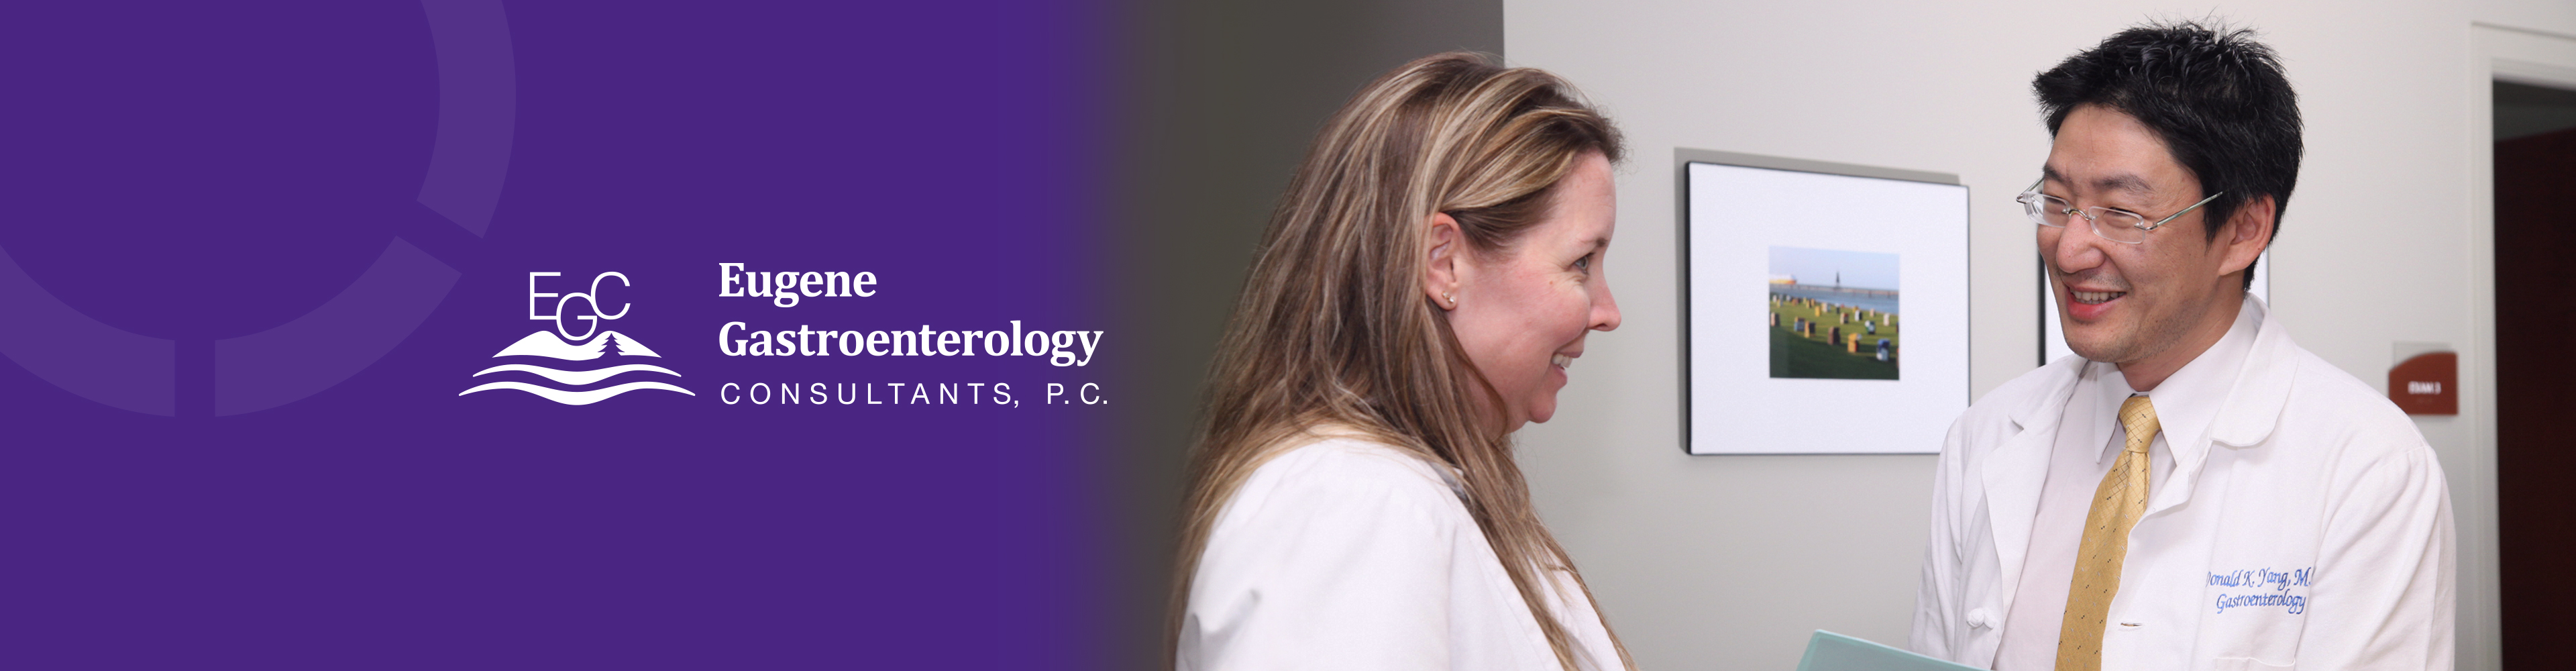 Eugene Gastroenterology Consultants - Northwest Health Partners